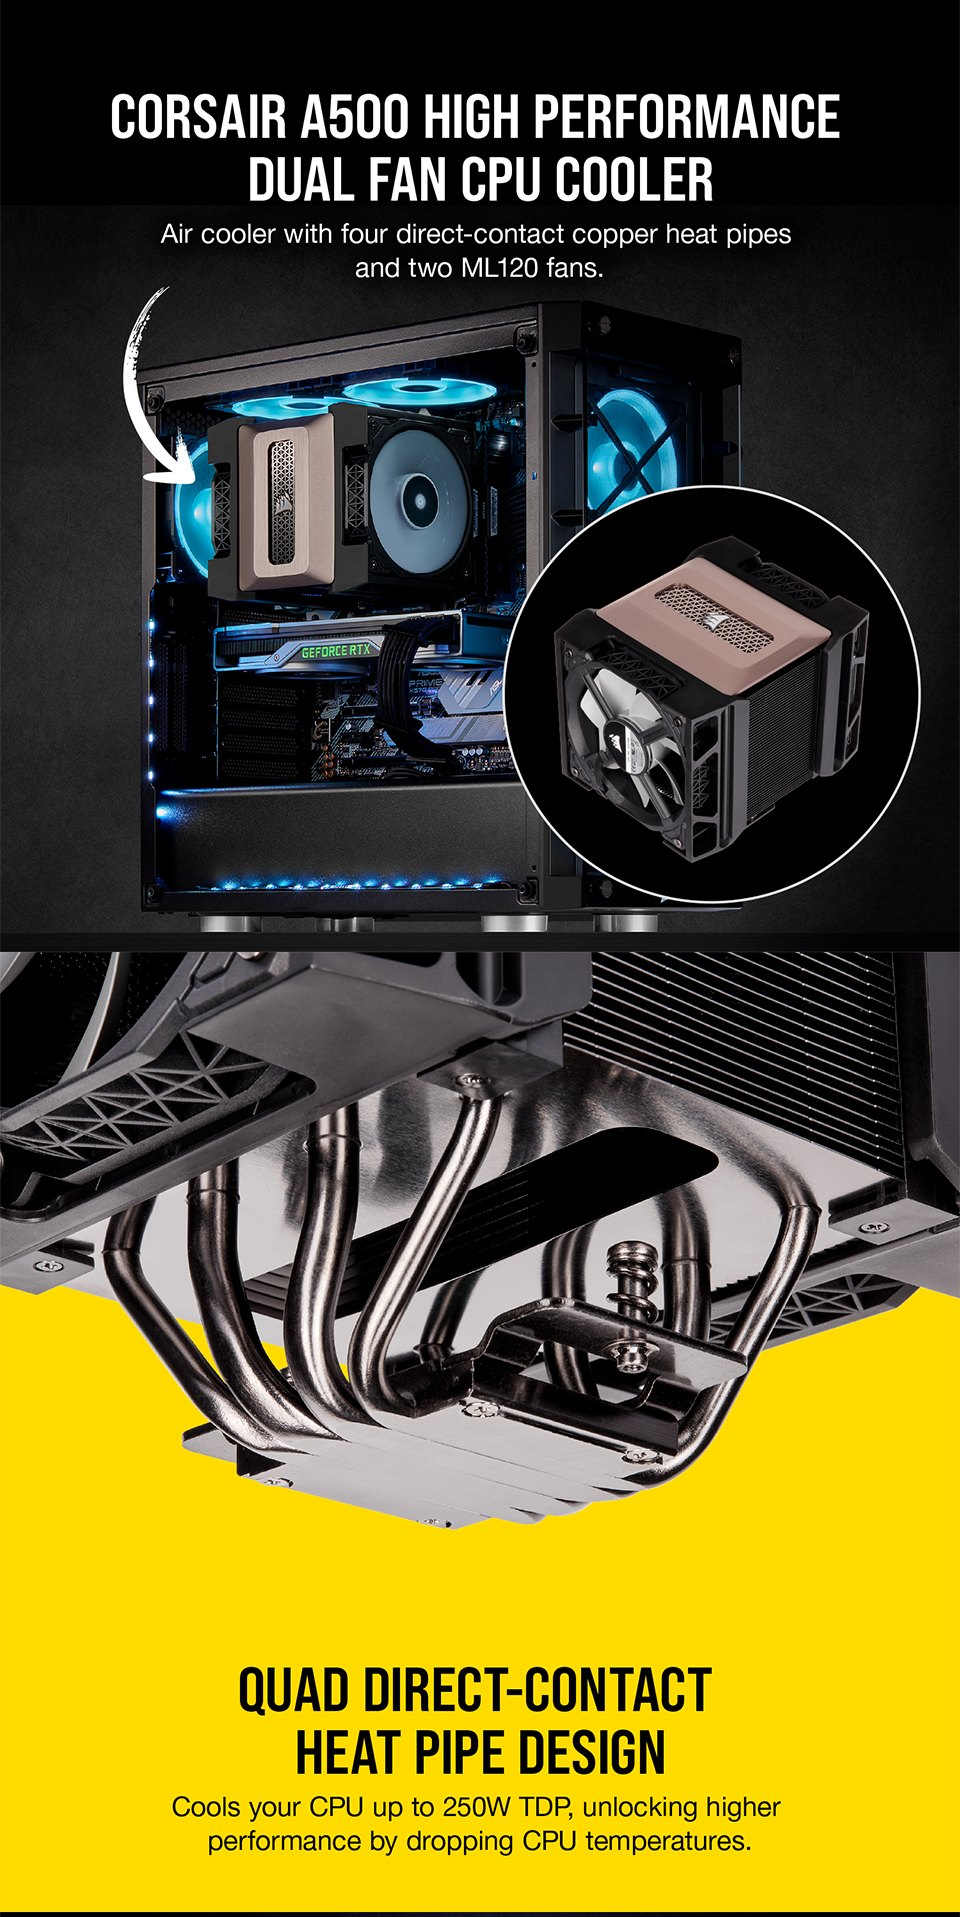 Corsair A500 High Performance Dual Fan CPU Cooler features